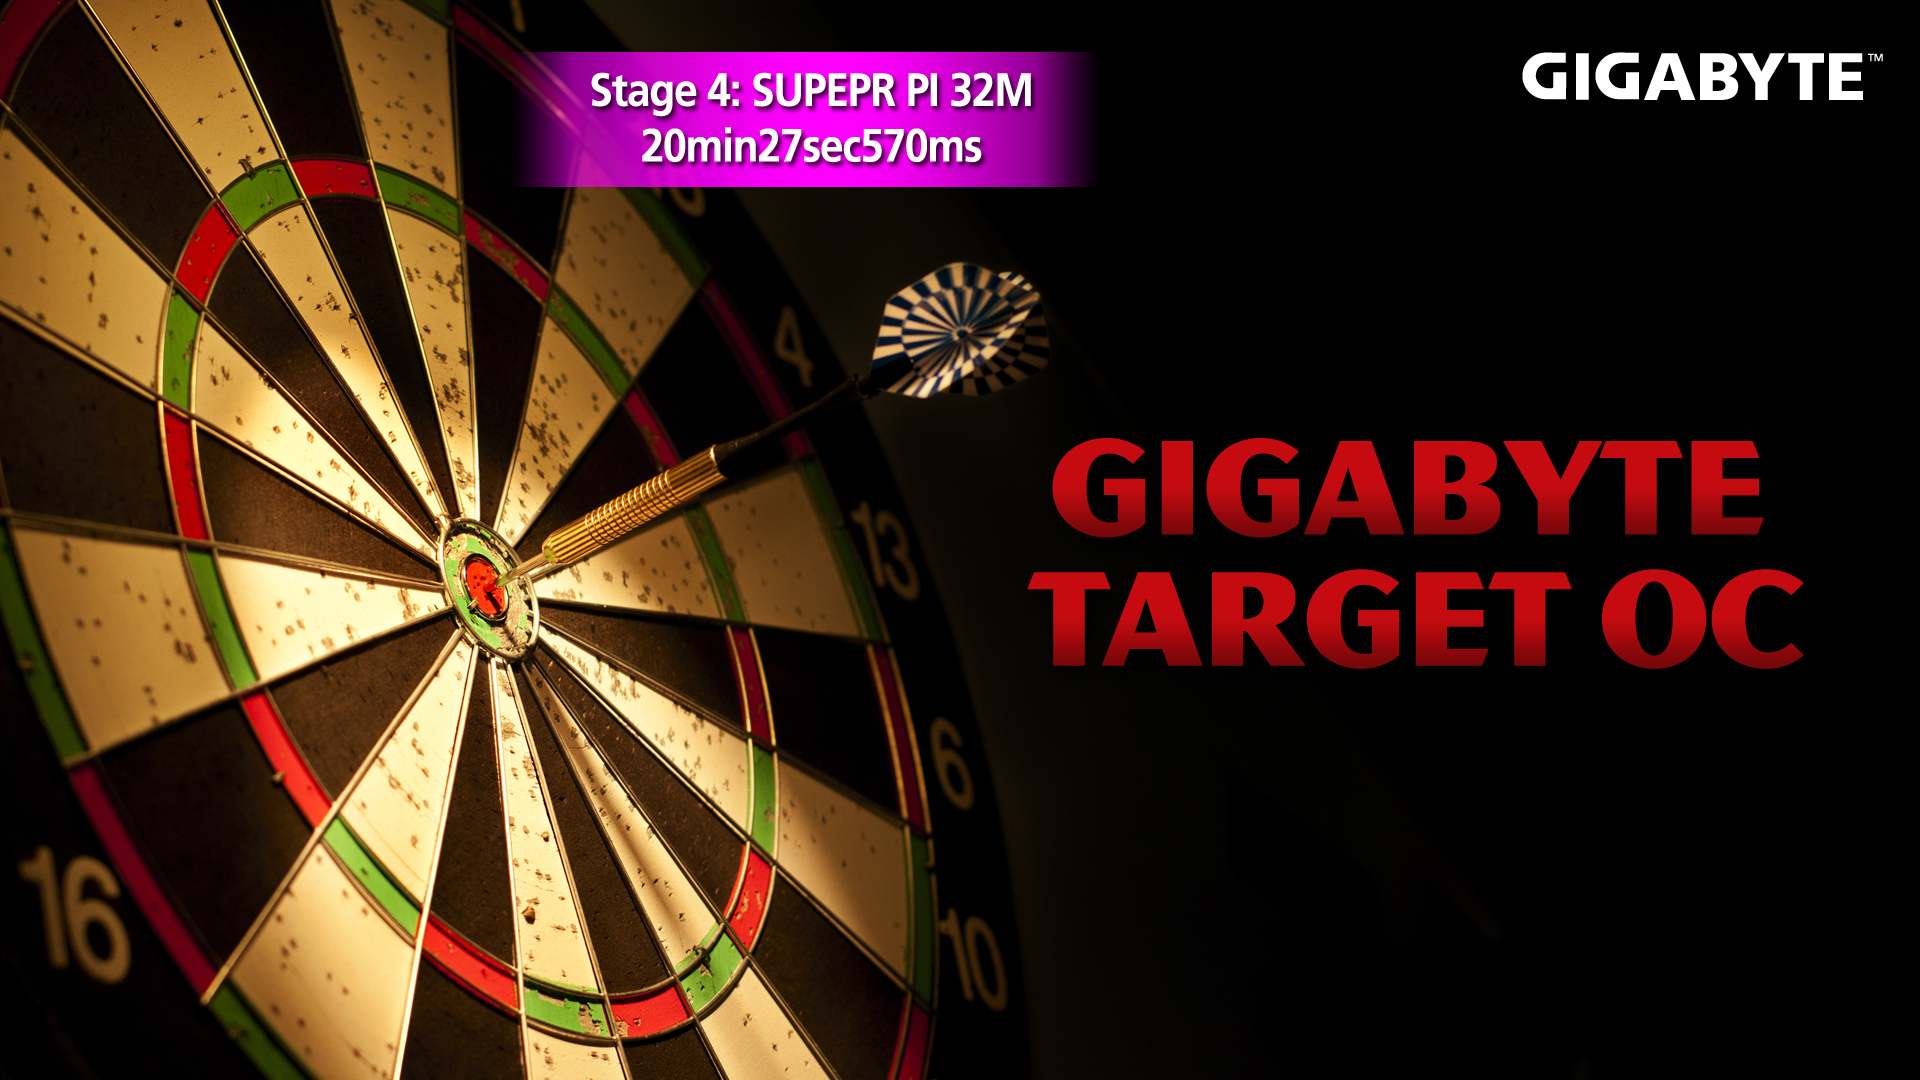 target_paticipants_1920x1080_4.jpg